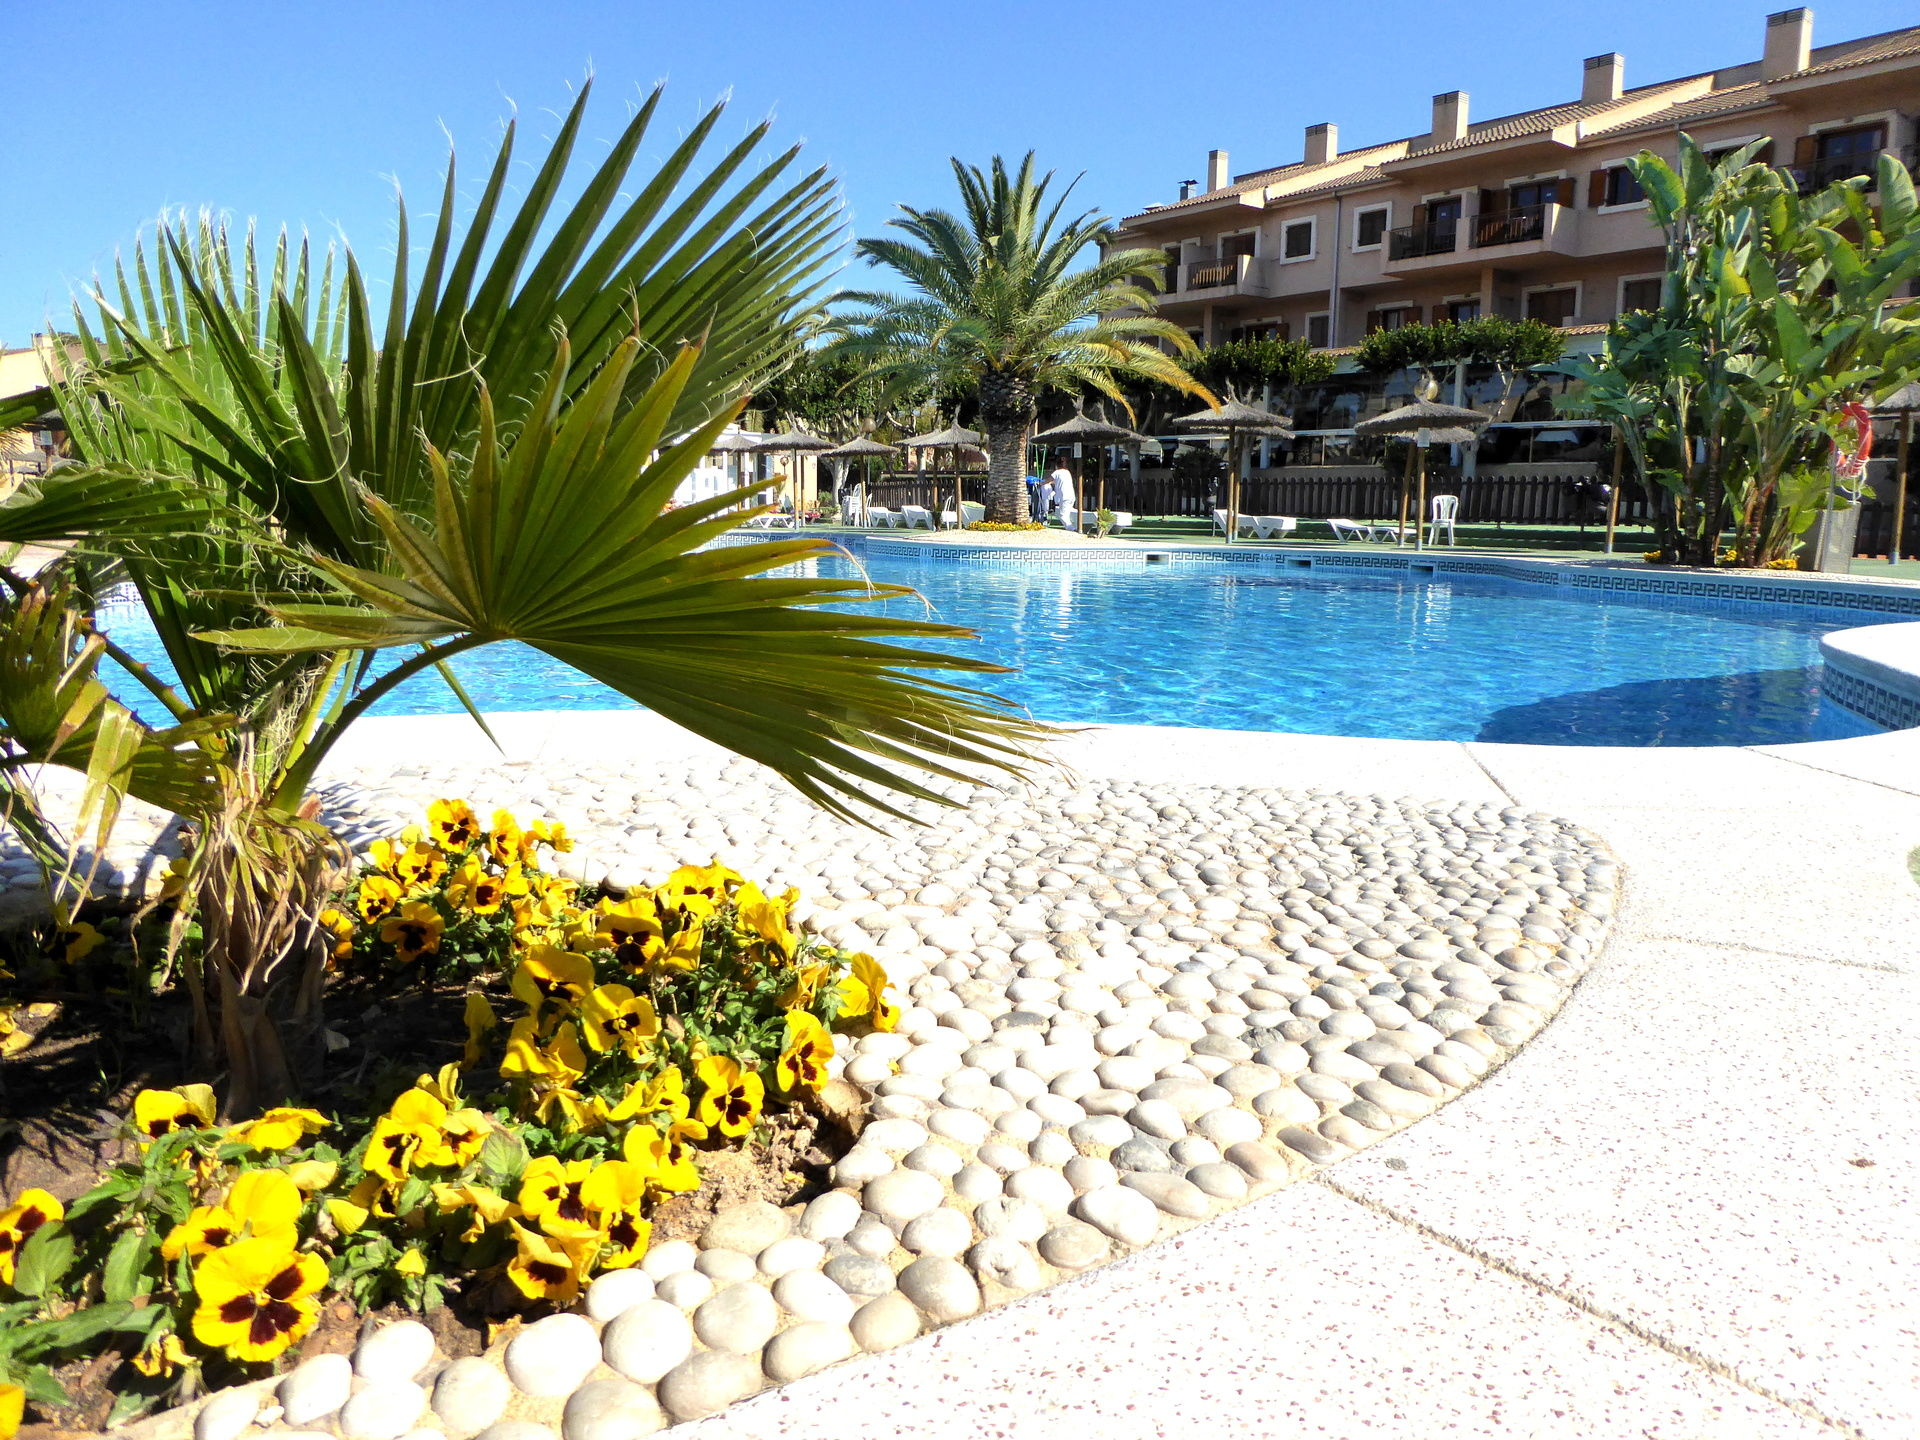 Hôtel albir garden resort 3*